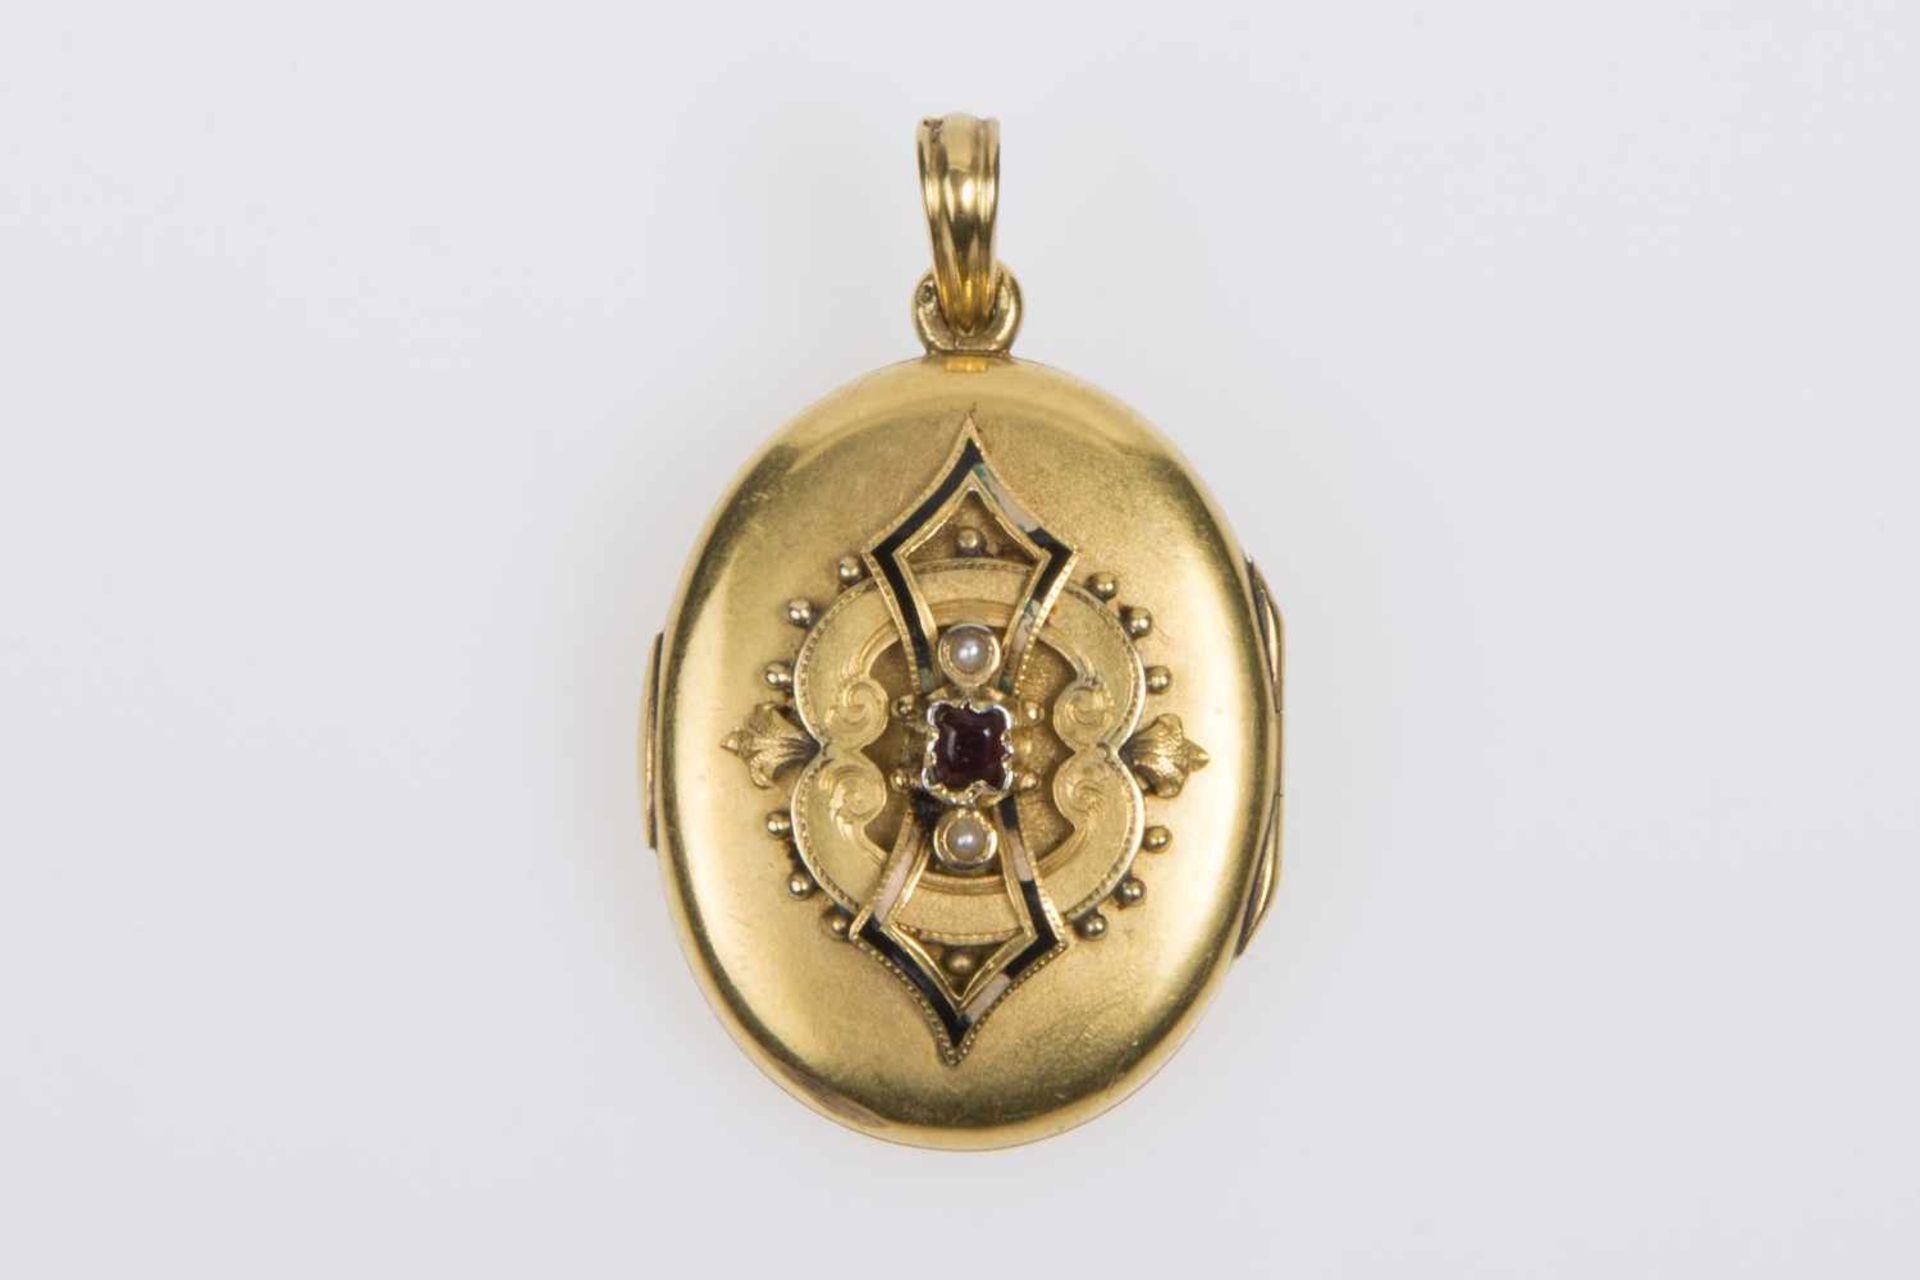 MedaillonGold 580, mit Haarlocke, Kontrollamtszeichen 1867-1872, 2 Halbperlen, 1 Granat, 10,8g;